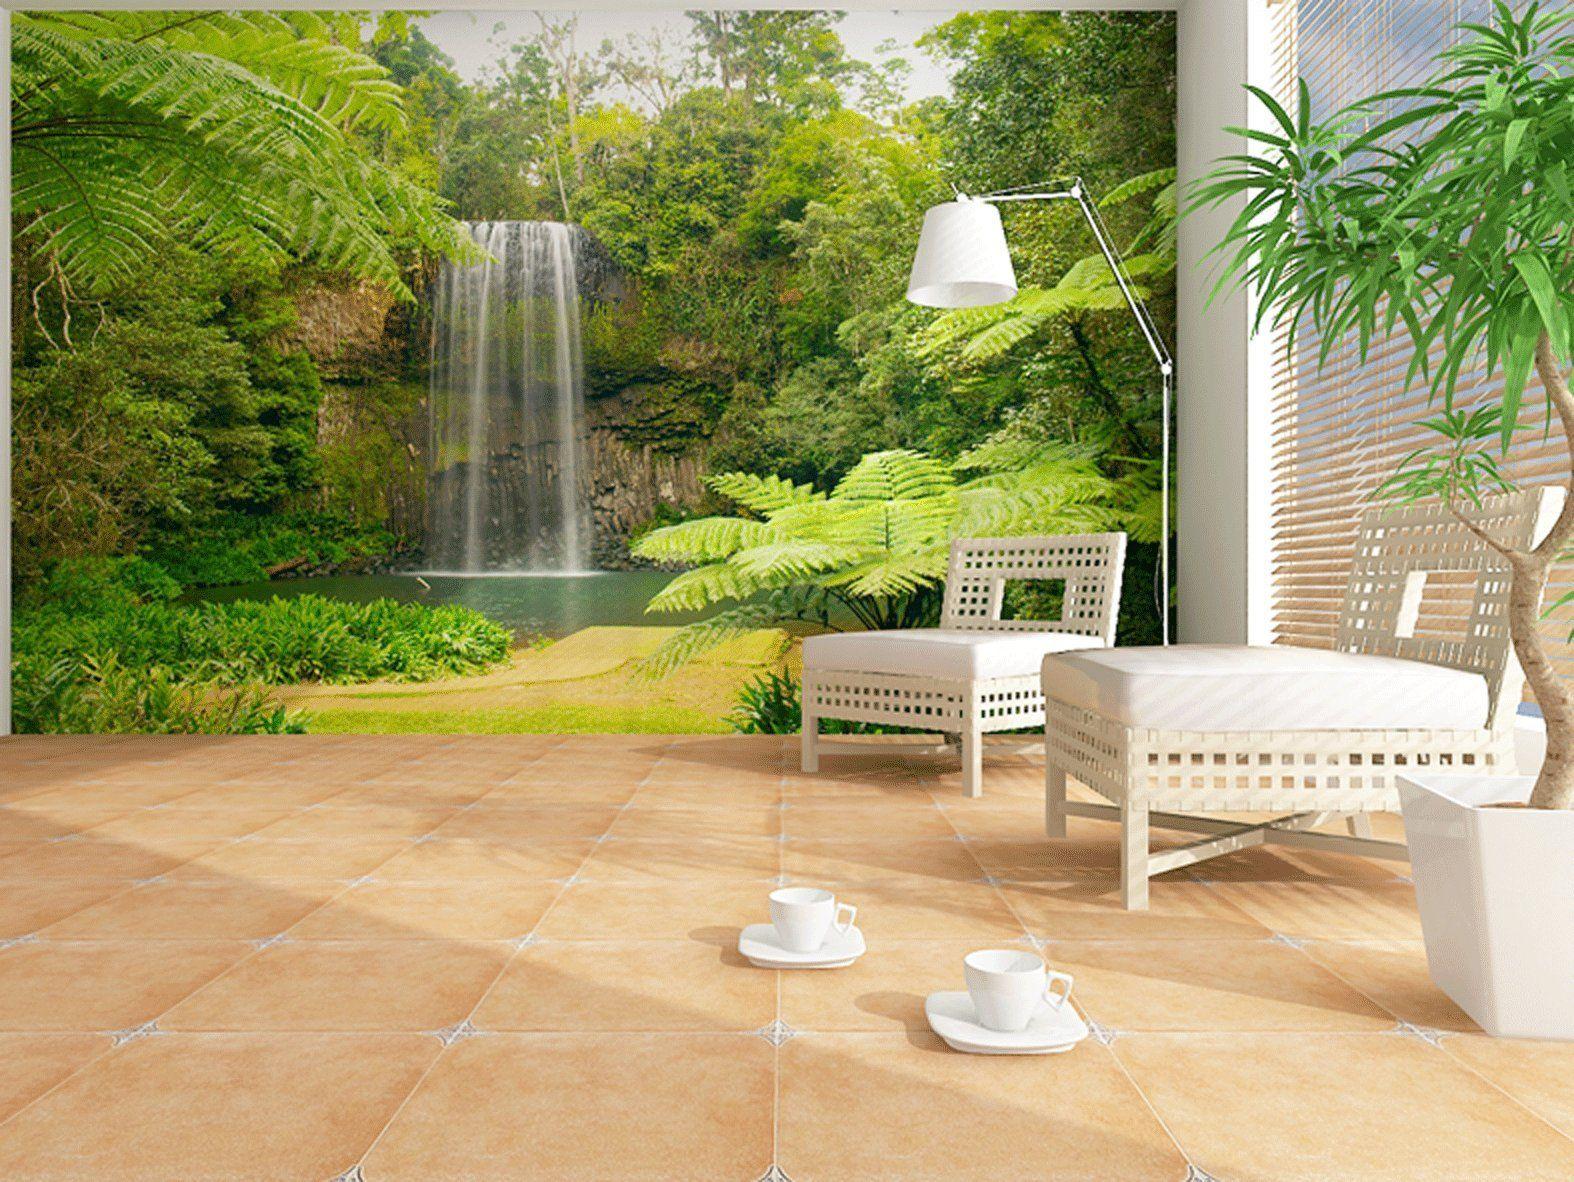 Fototapete Tropischer Wasserfall Grosse 360 X 270 Cm Vierteilig Amazon De Kuche Haushalt Aussenwanddekorationen Fototapete Wandbild Wand